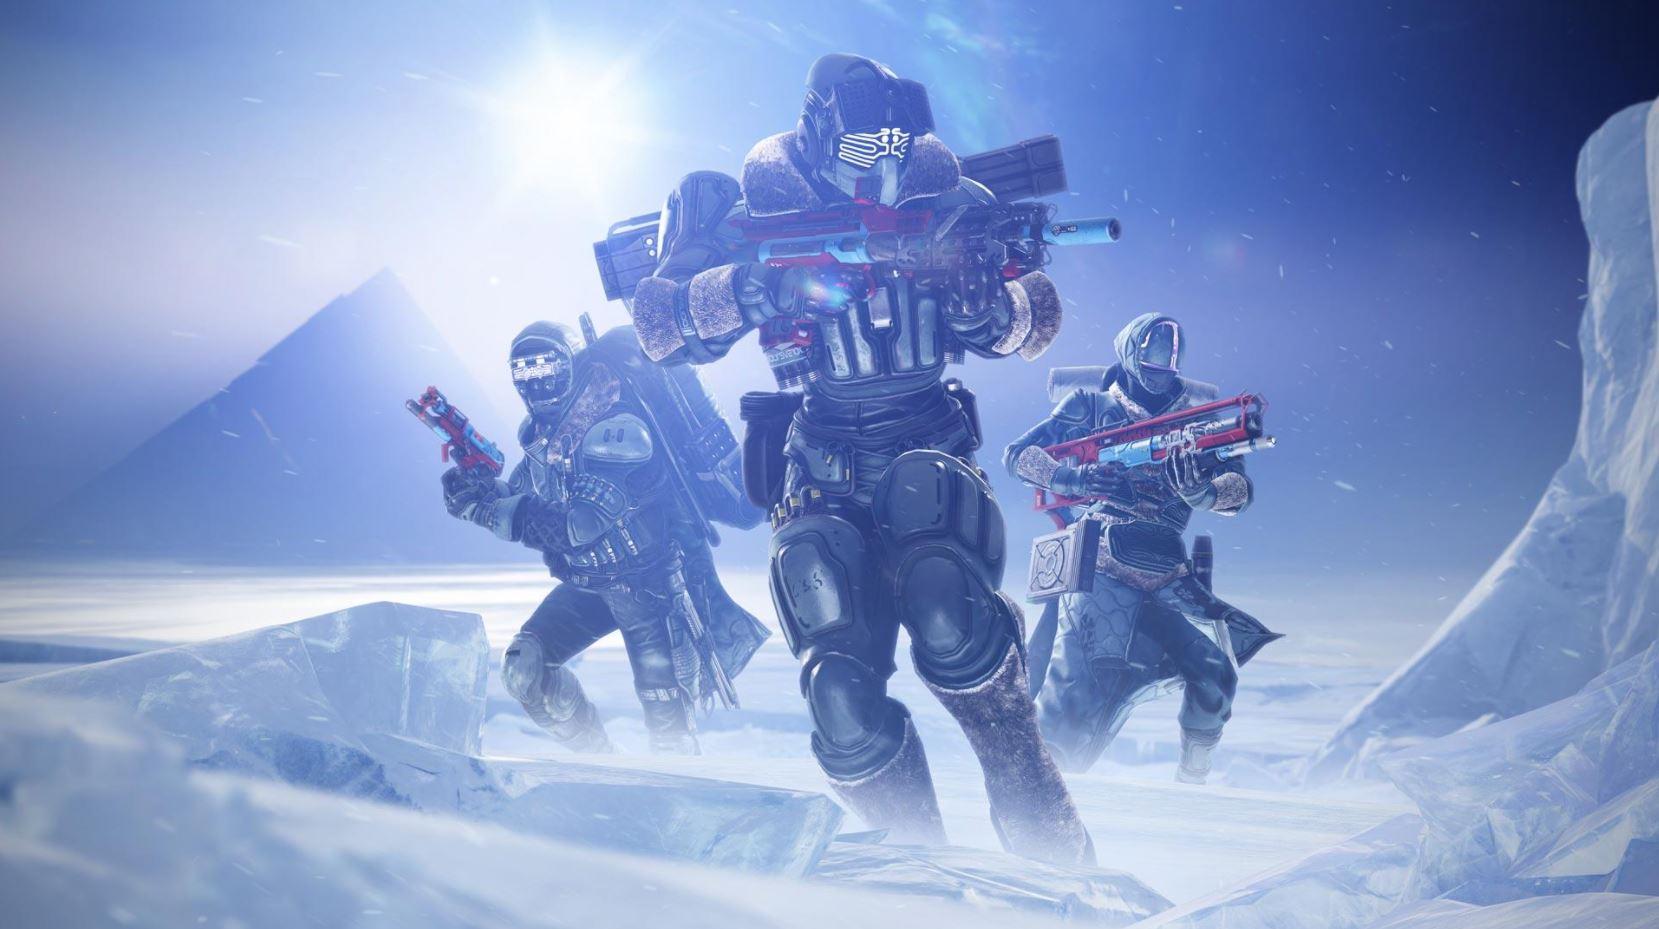 destiny-2-beyond-light-ps5-review